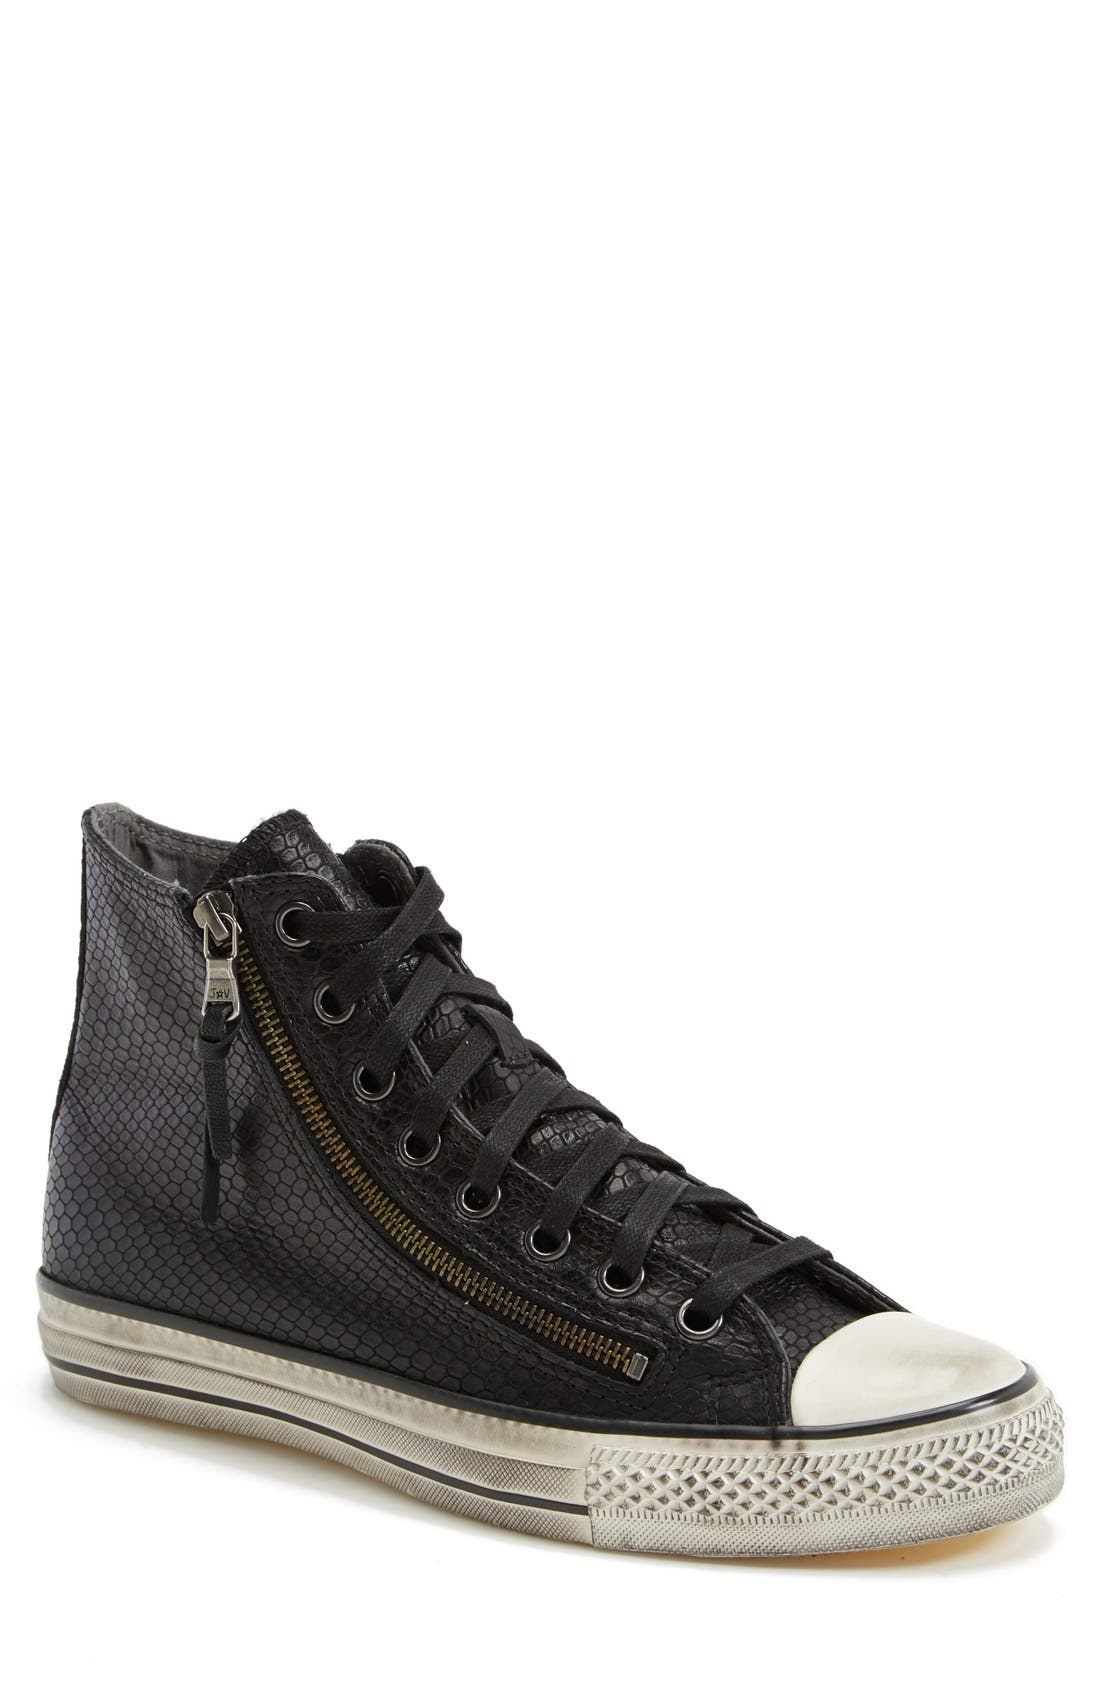 Chuck Taylor<sup>®</sup> All Star<sup>®</sup> Zip Sneaker,                             Main thumbnail 1, color,                             001